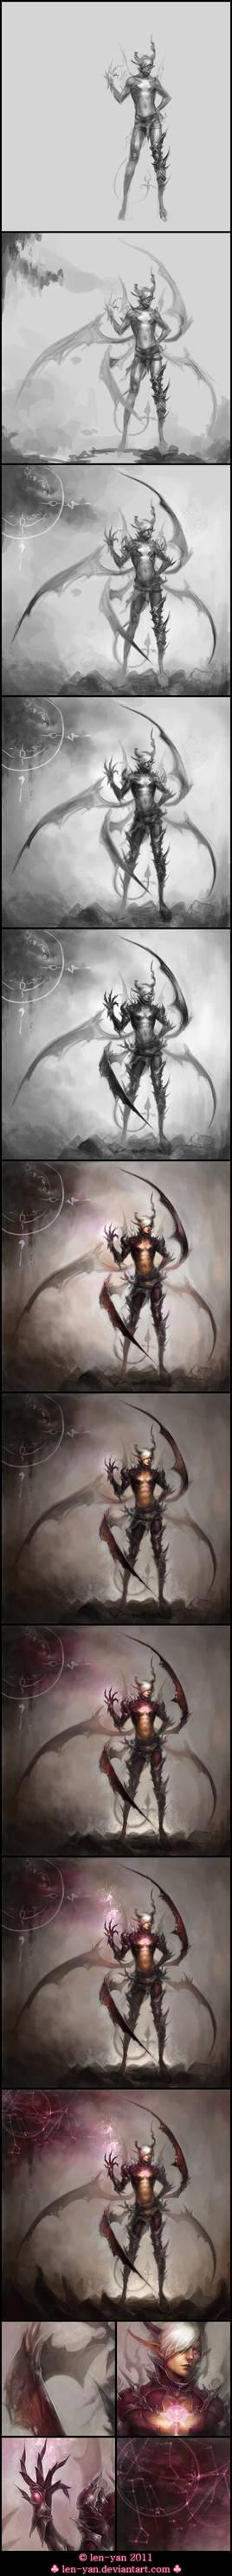 dark omen - progress